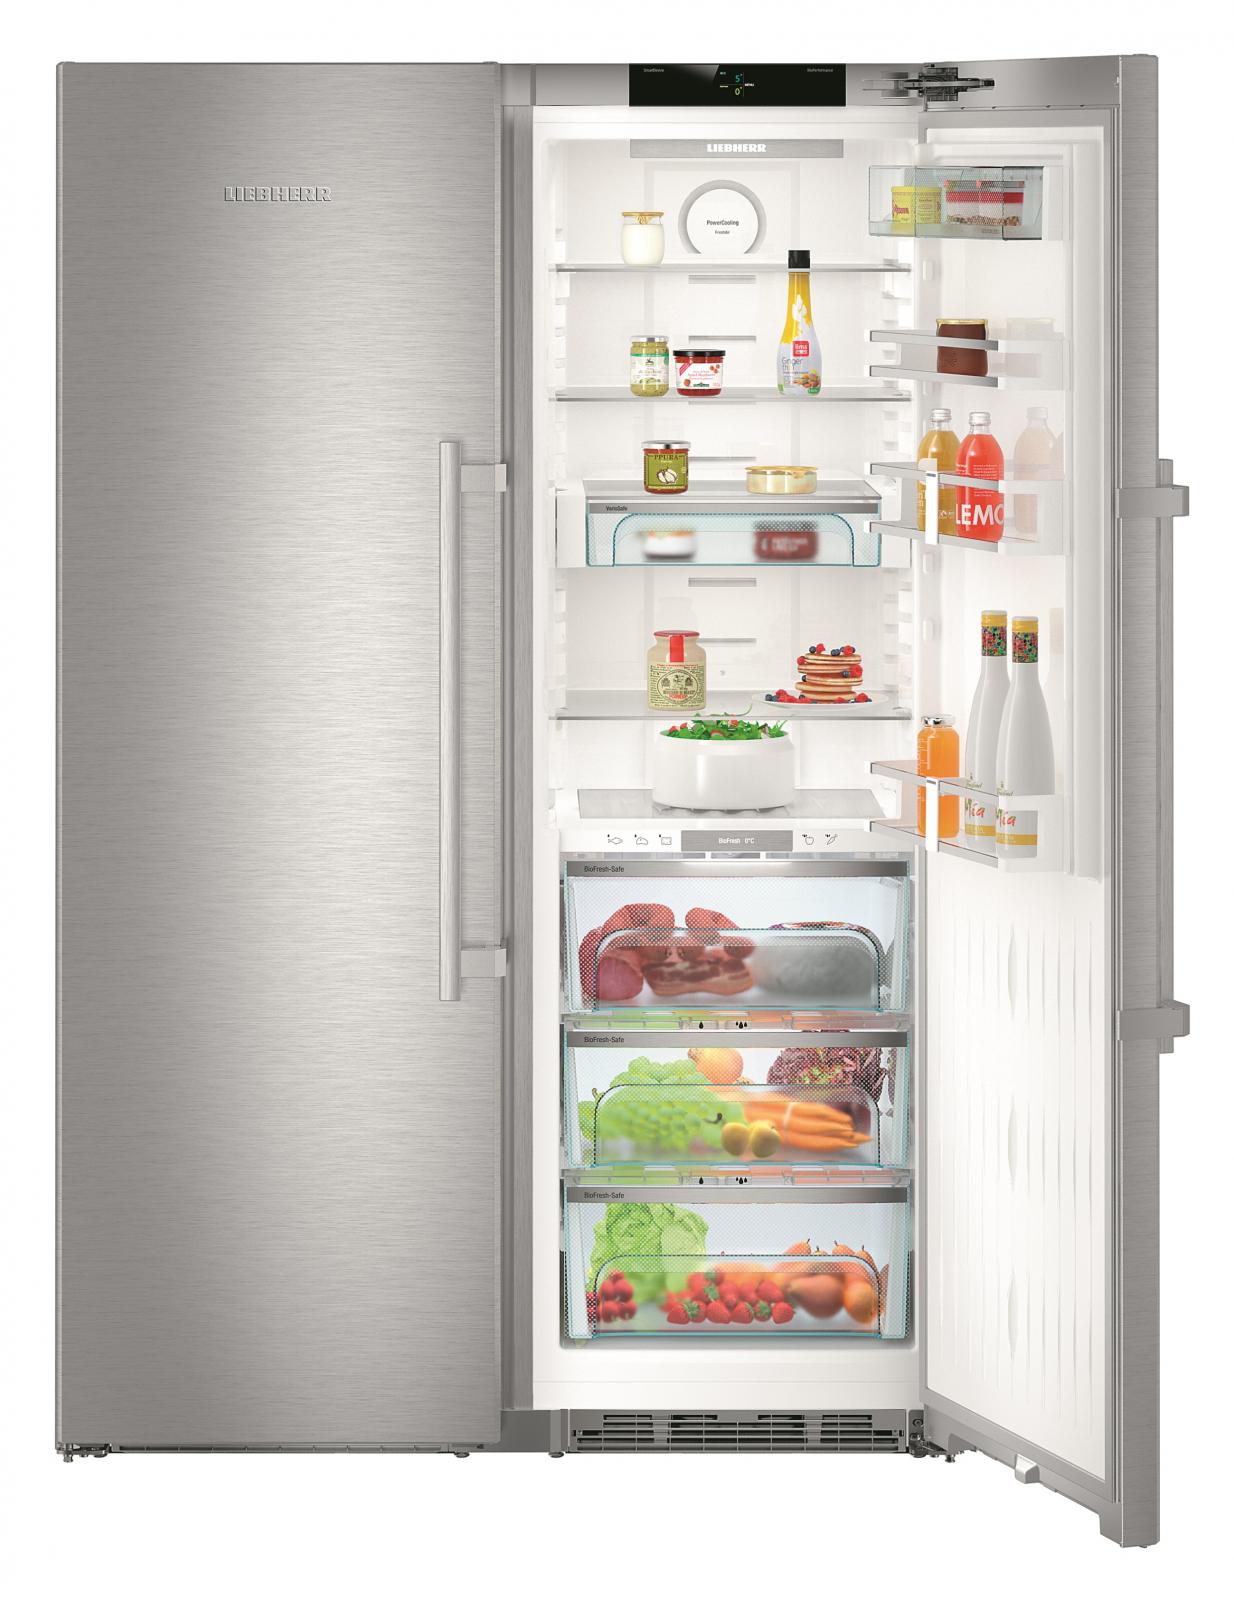 купить Side-by-Side холодильник Liebherr SBSes 8663 Украина фото 4